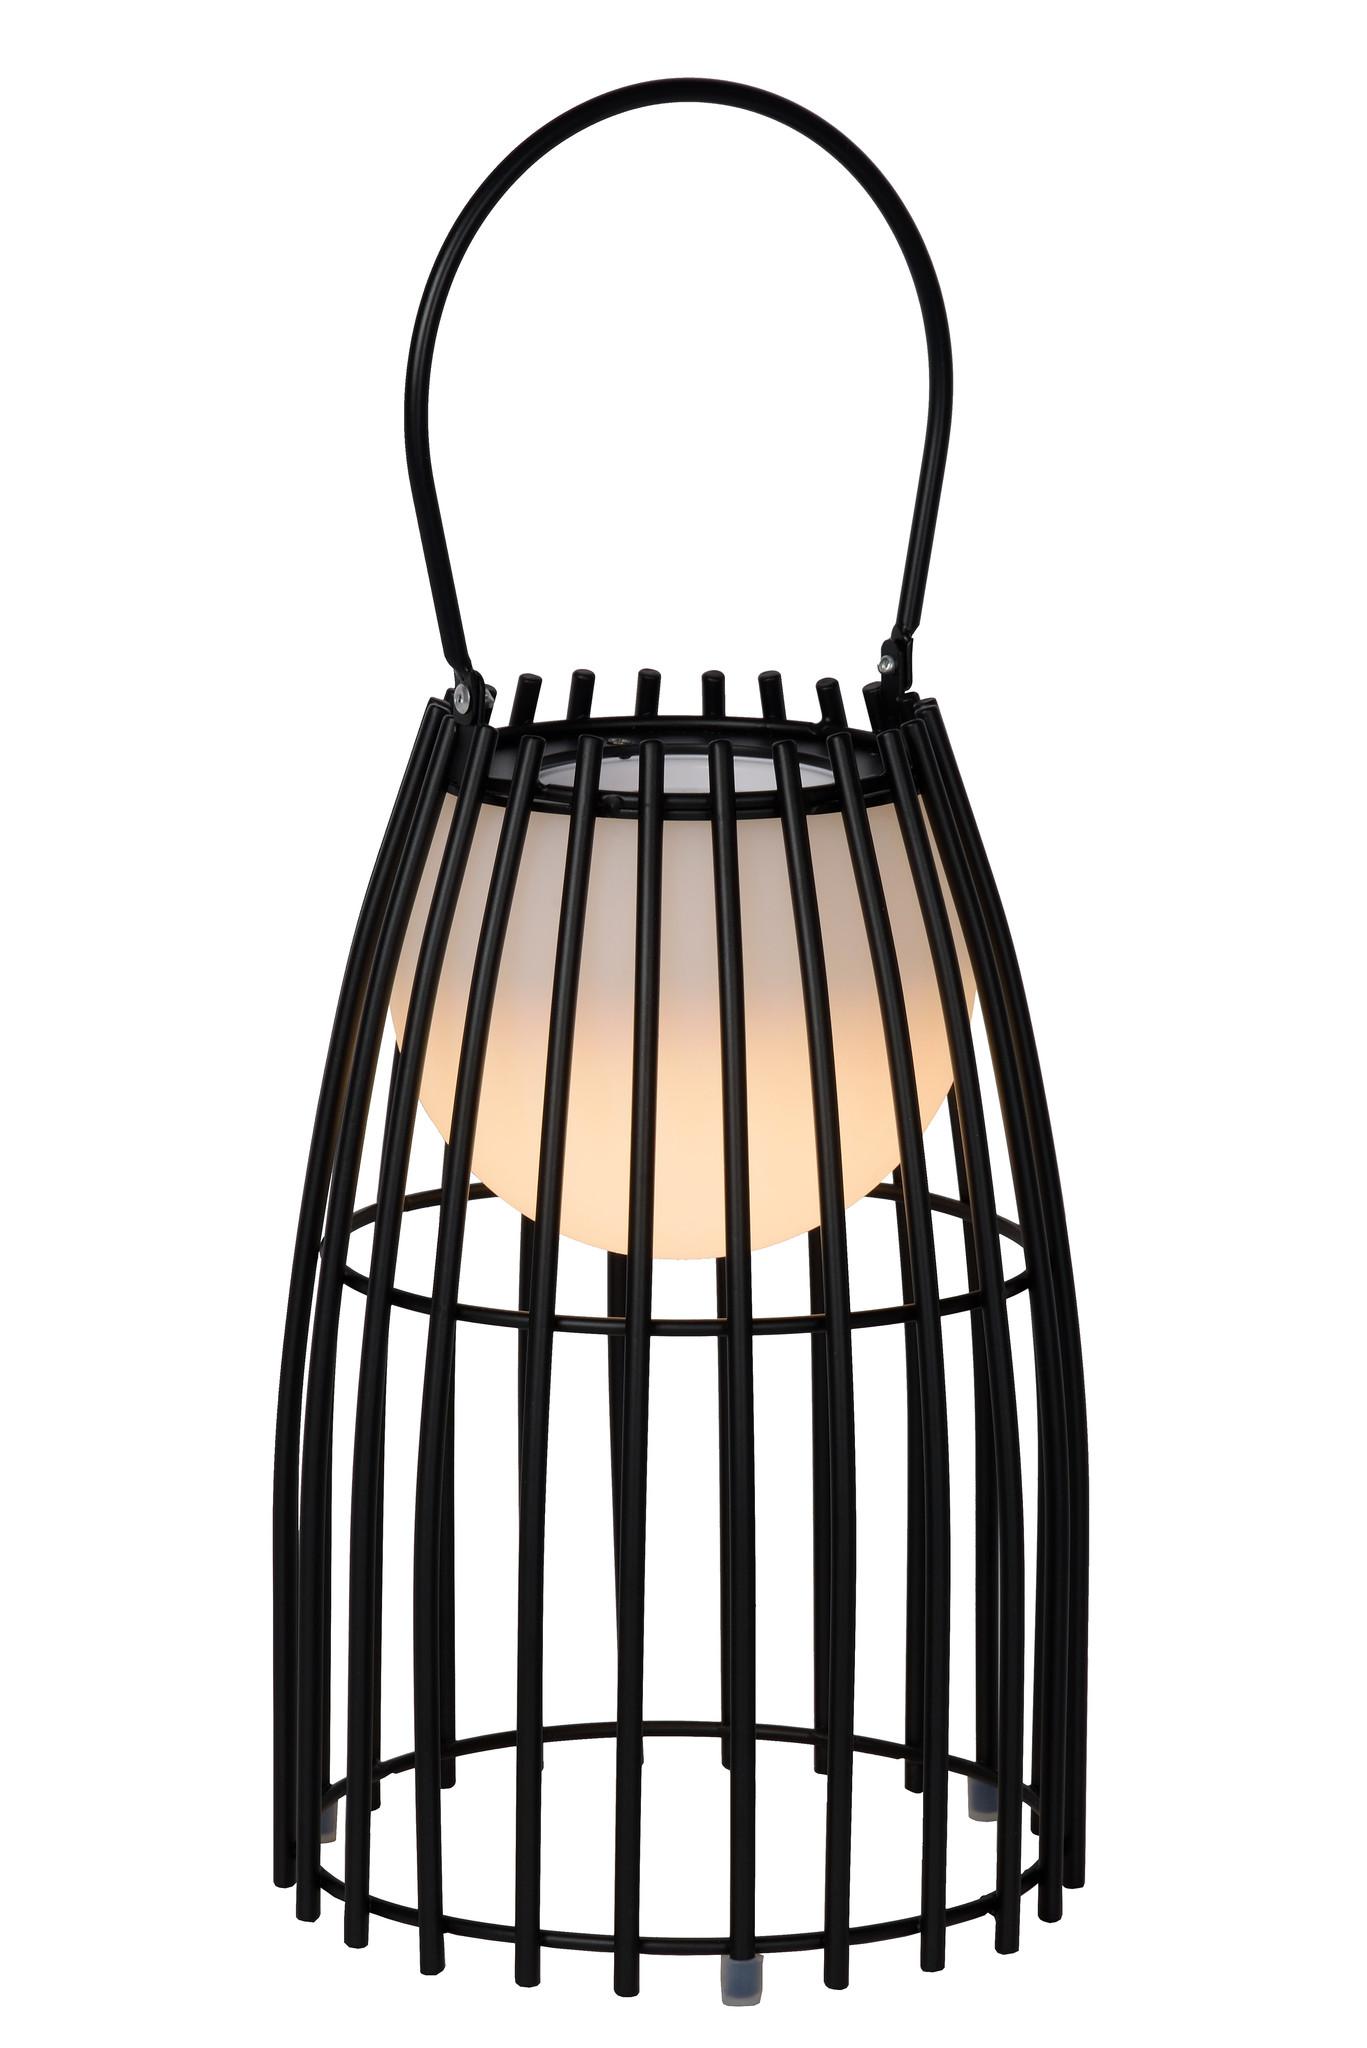 Lucide FJARA Tafellamp Buiten-Zwart-Ø17,5-LED Dimb.-0,3W